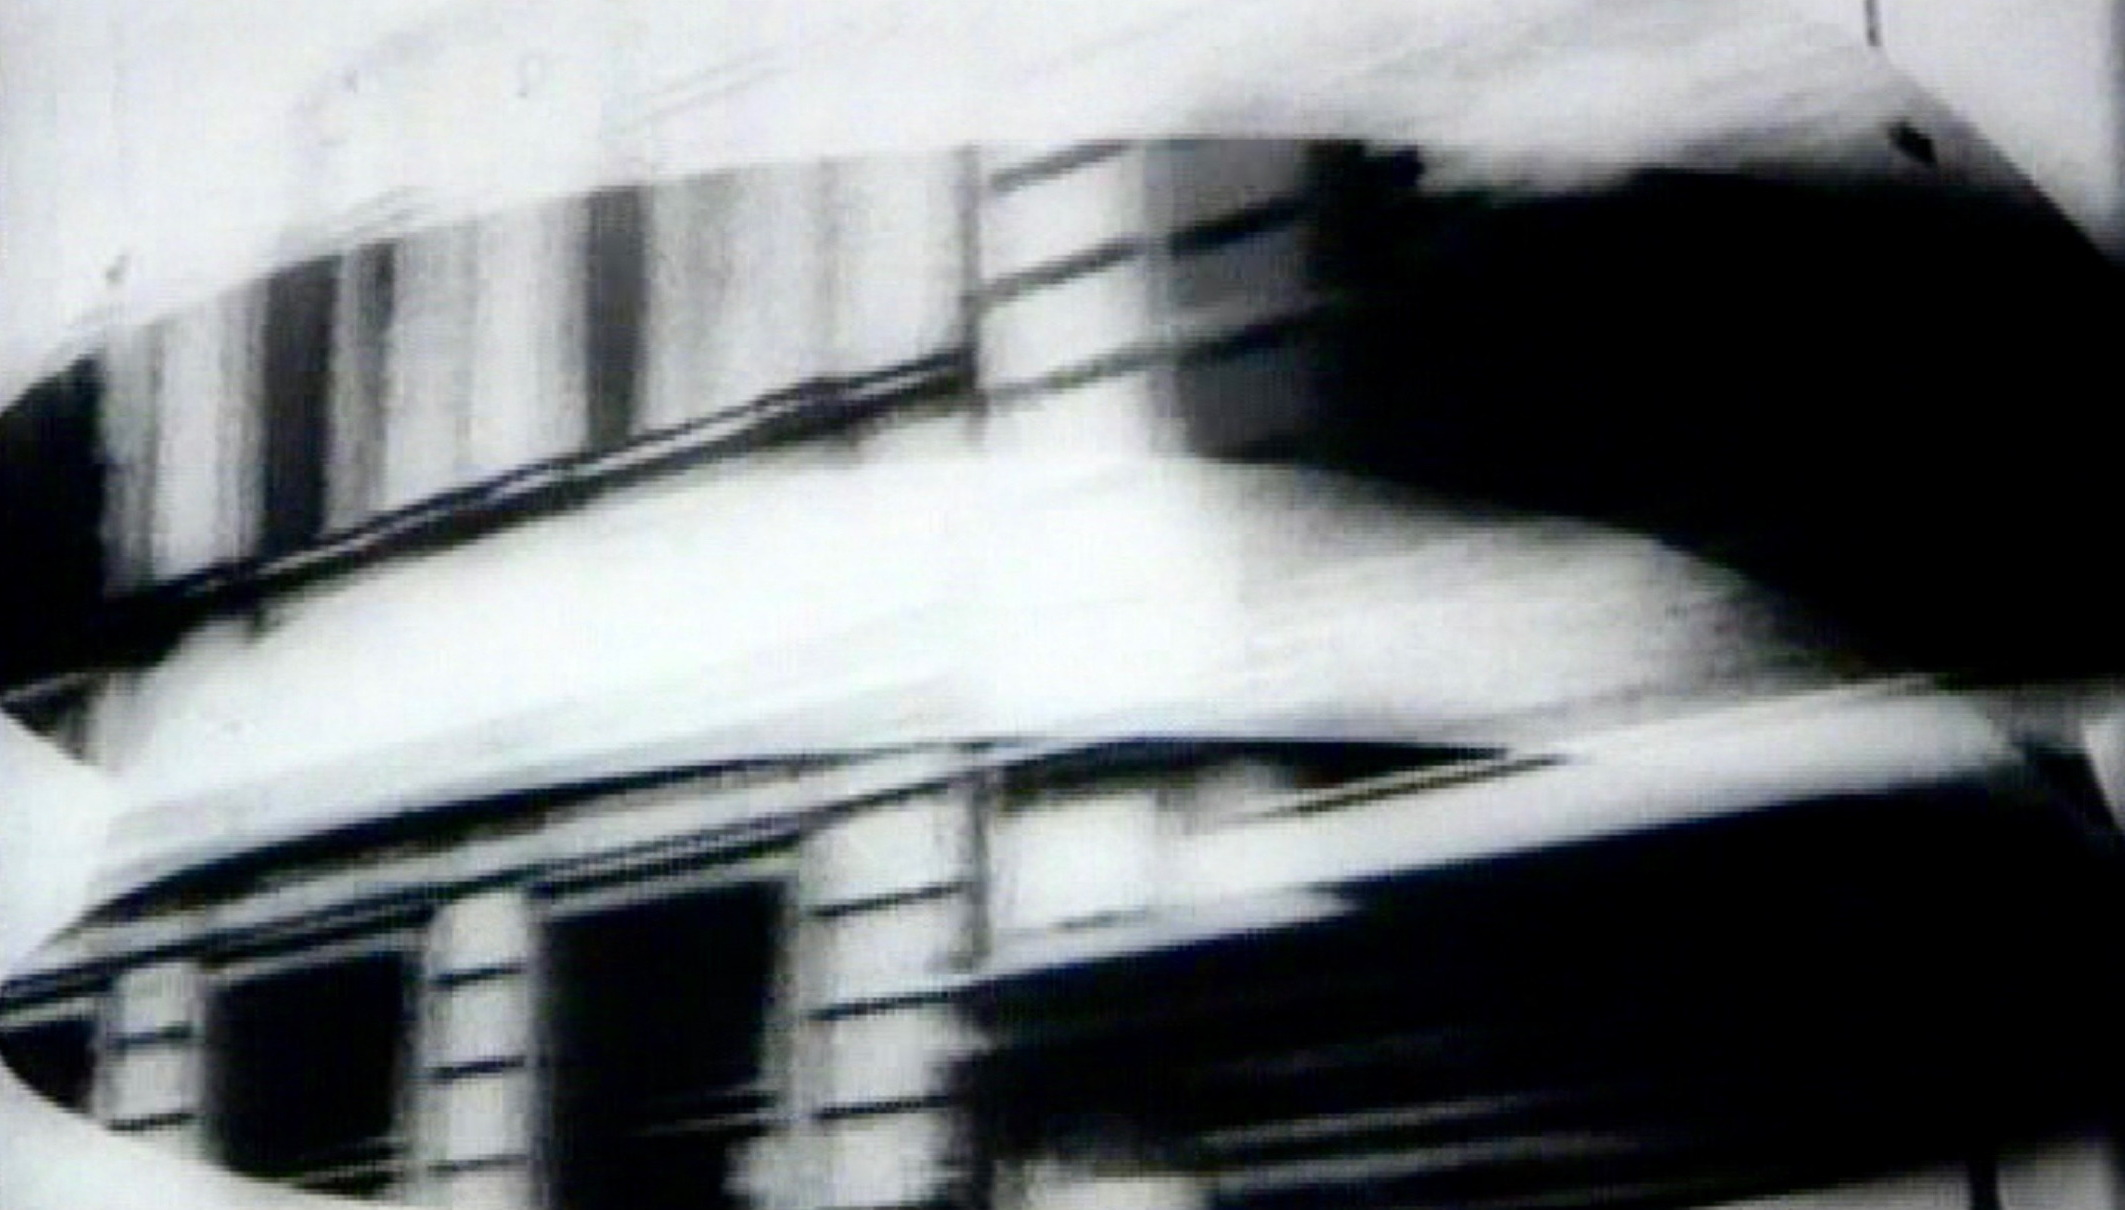 Nico Icon - Schwarzweiss-Szene - Regie Susanne Ofteringer - Kamera Judith Kaufmann